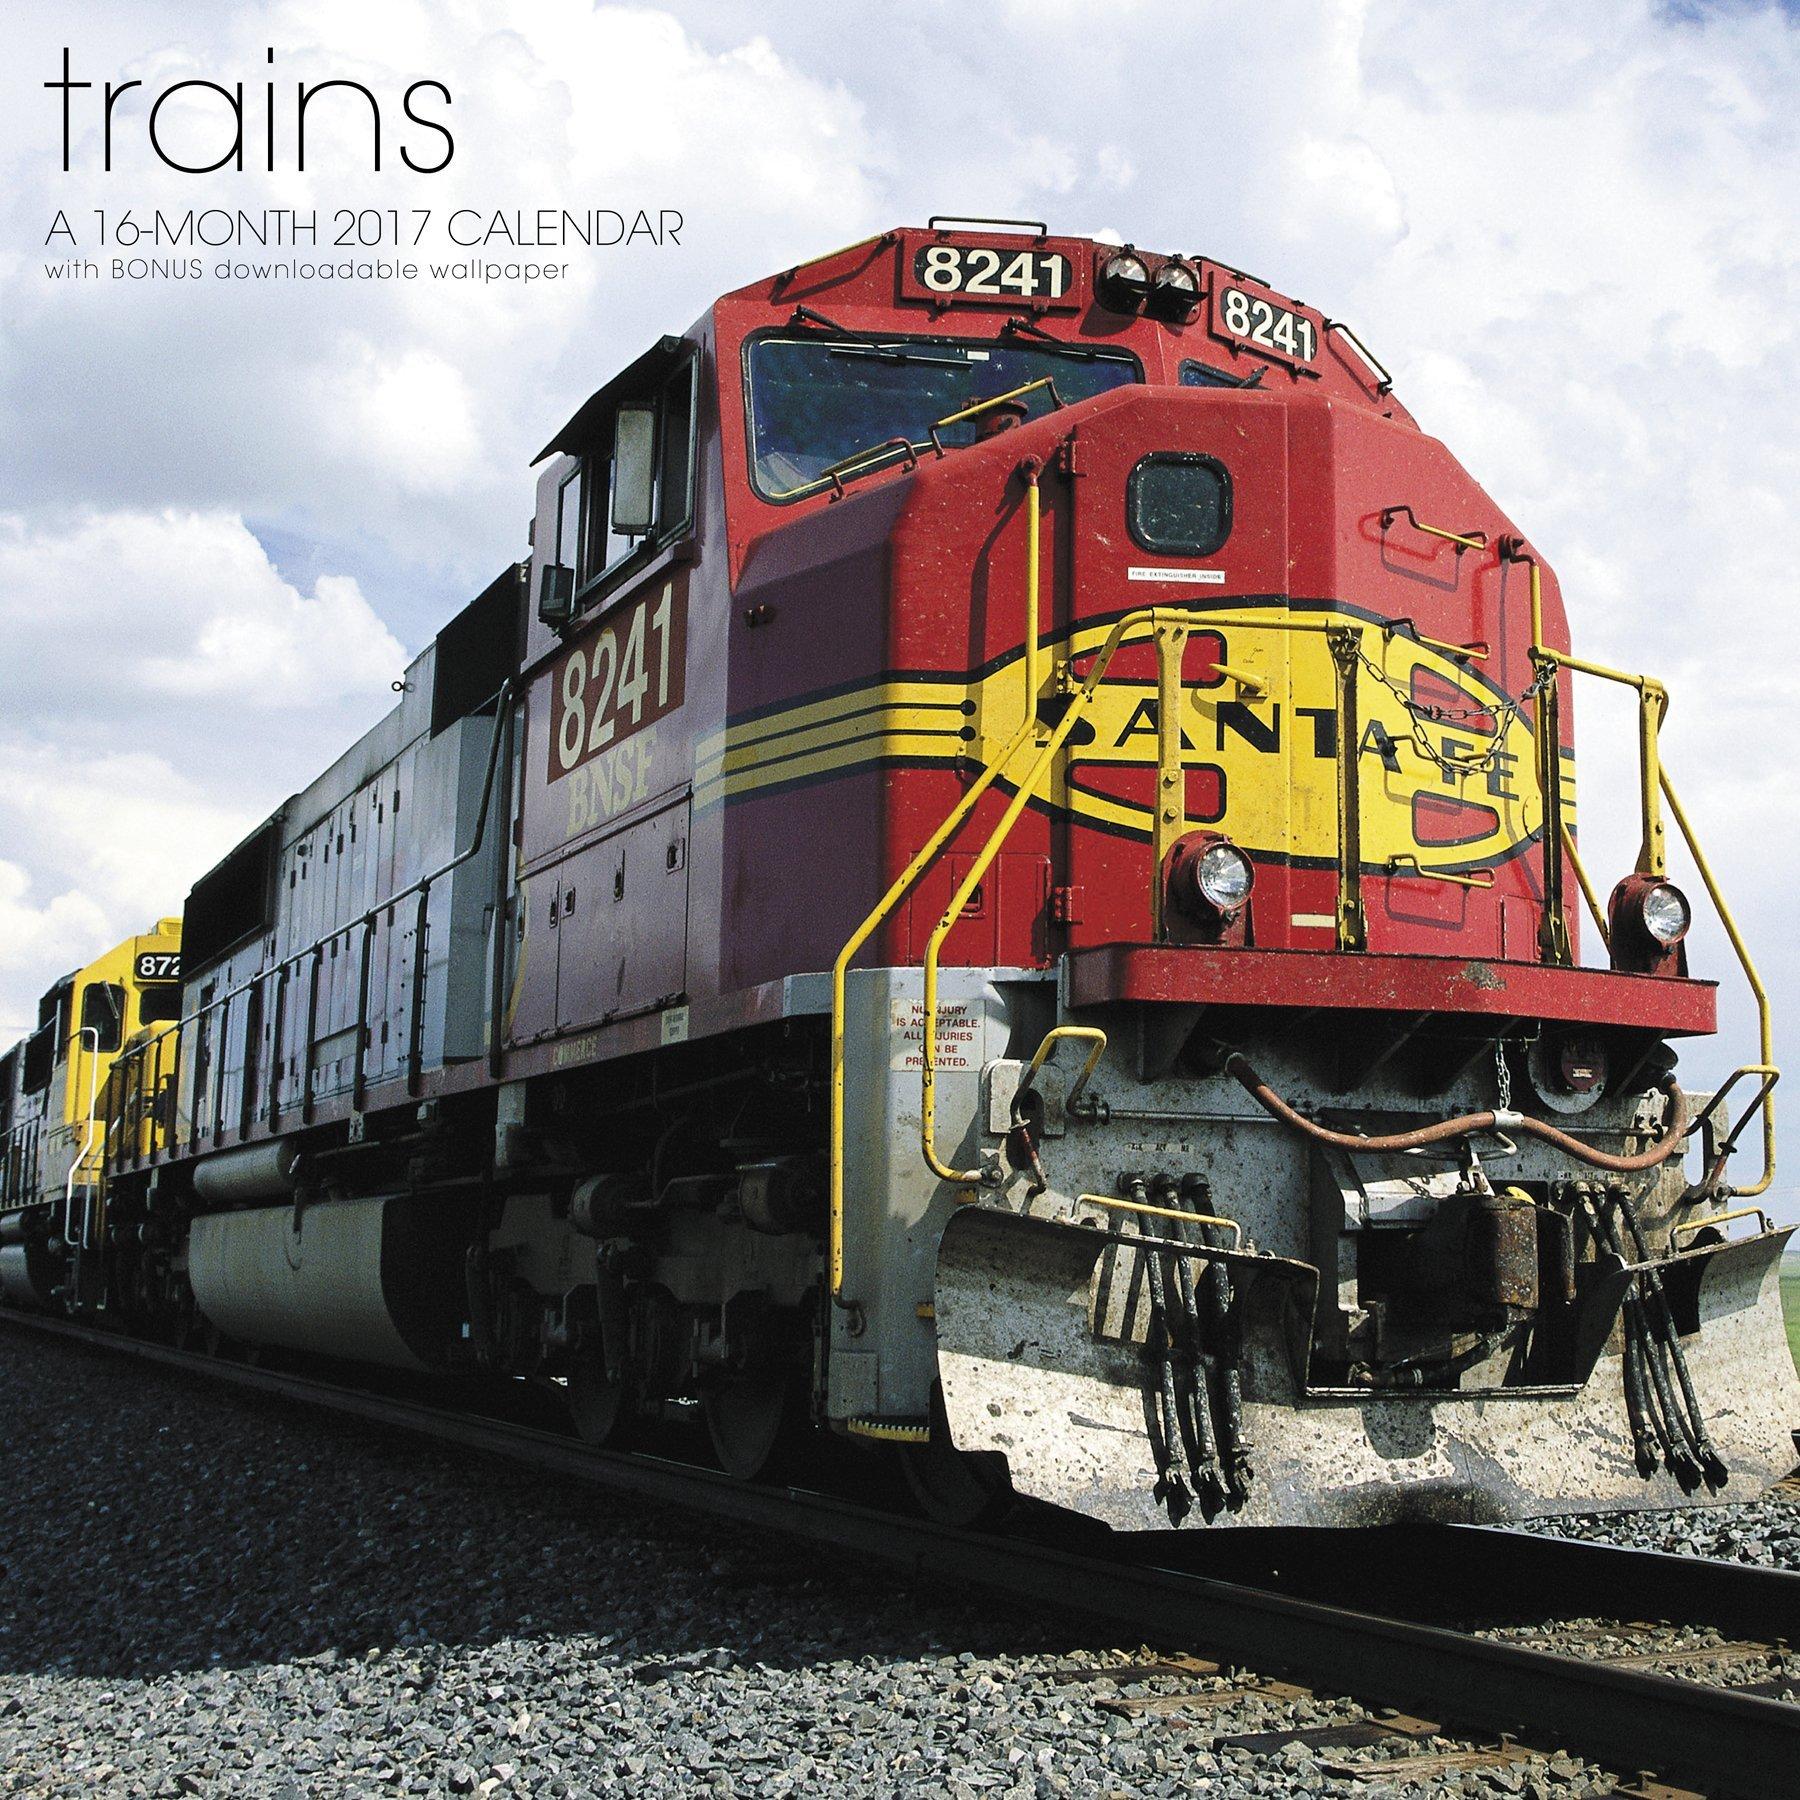 2017 trains